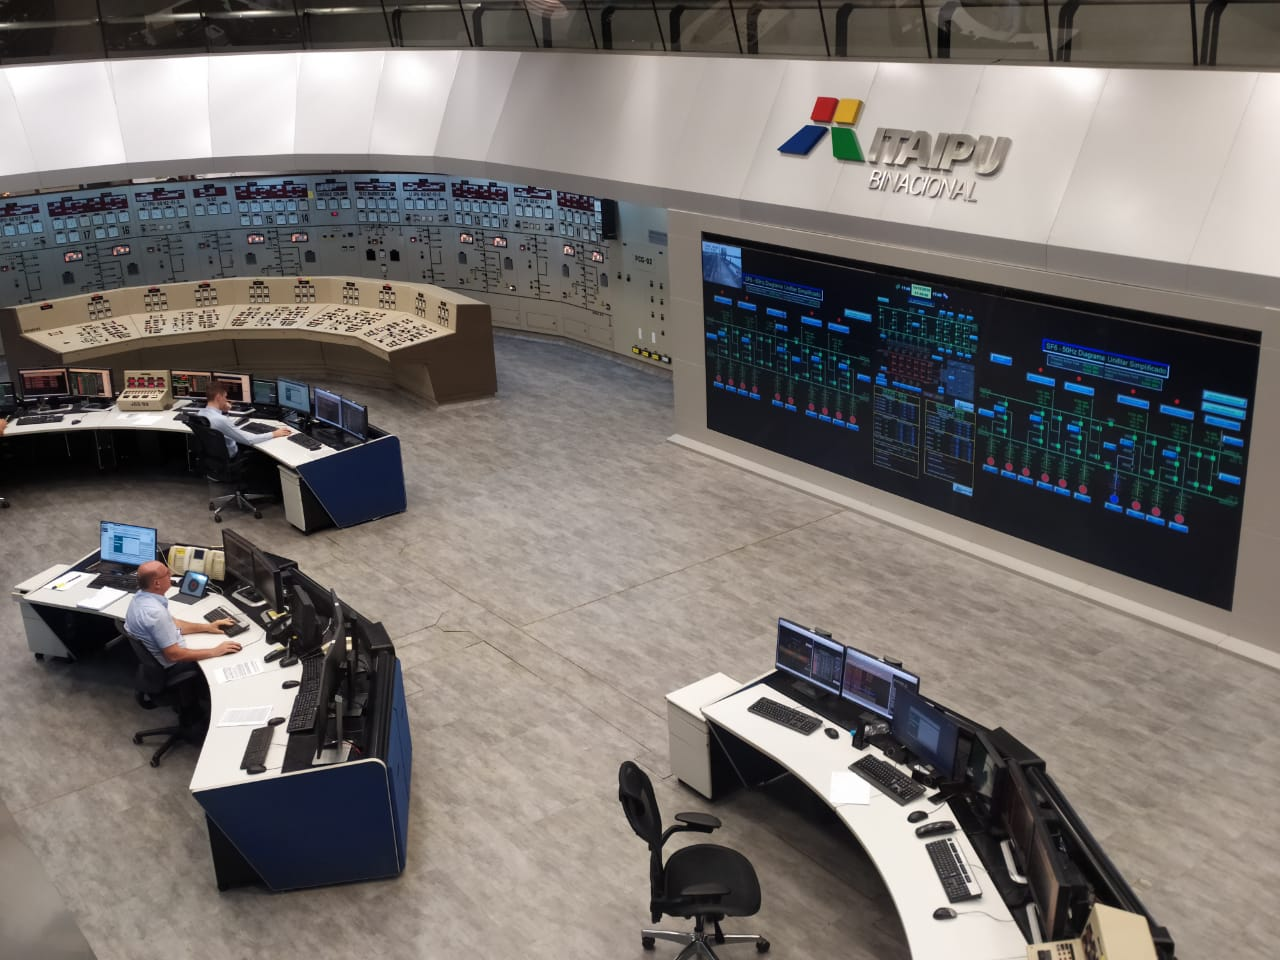 COVID-19 suspende convocatoria tecnológica por US$660mn de Itaipú